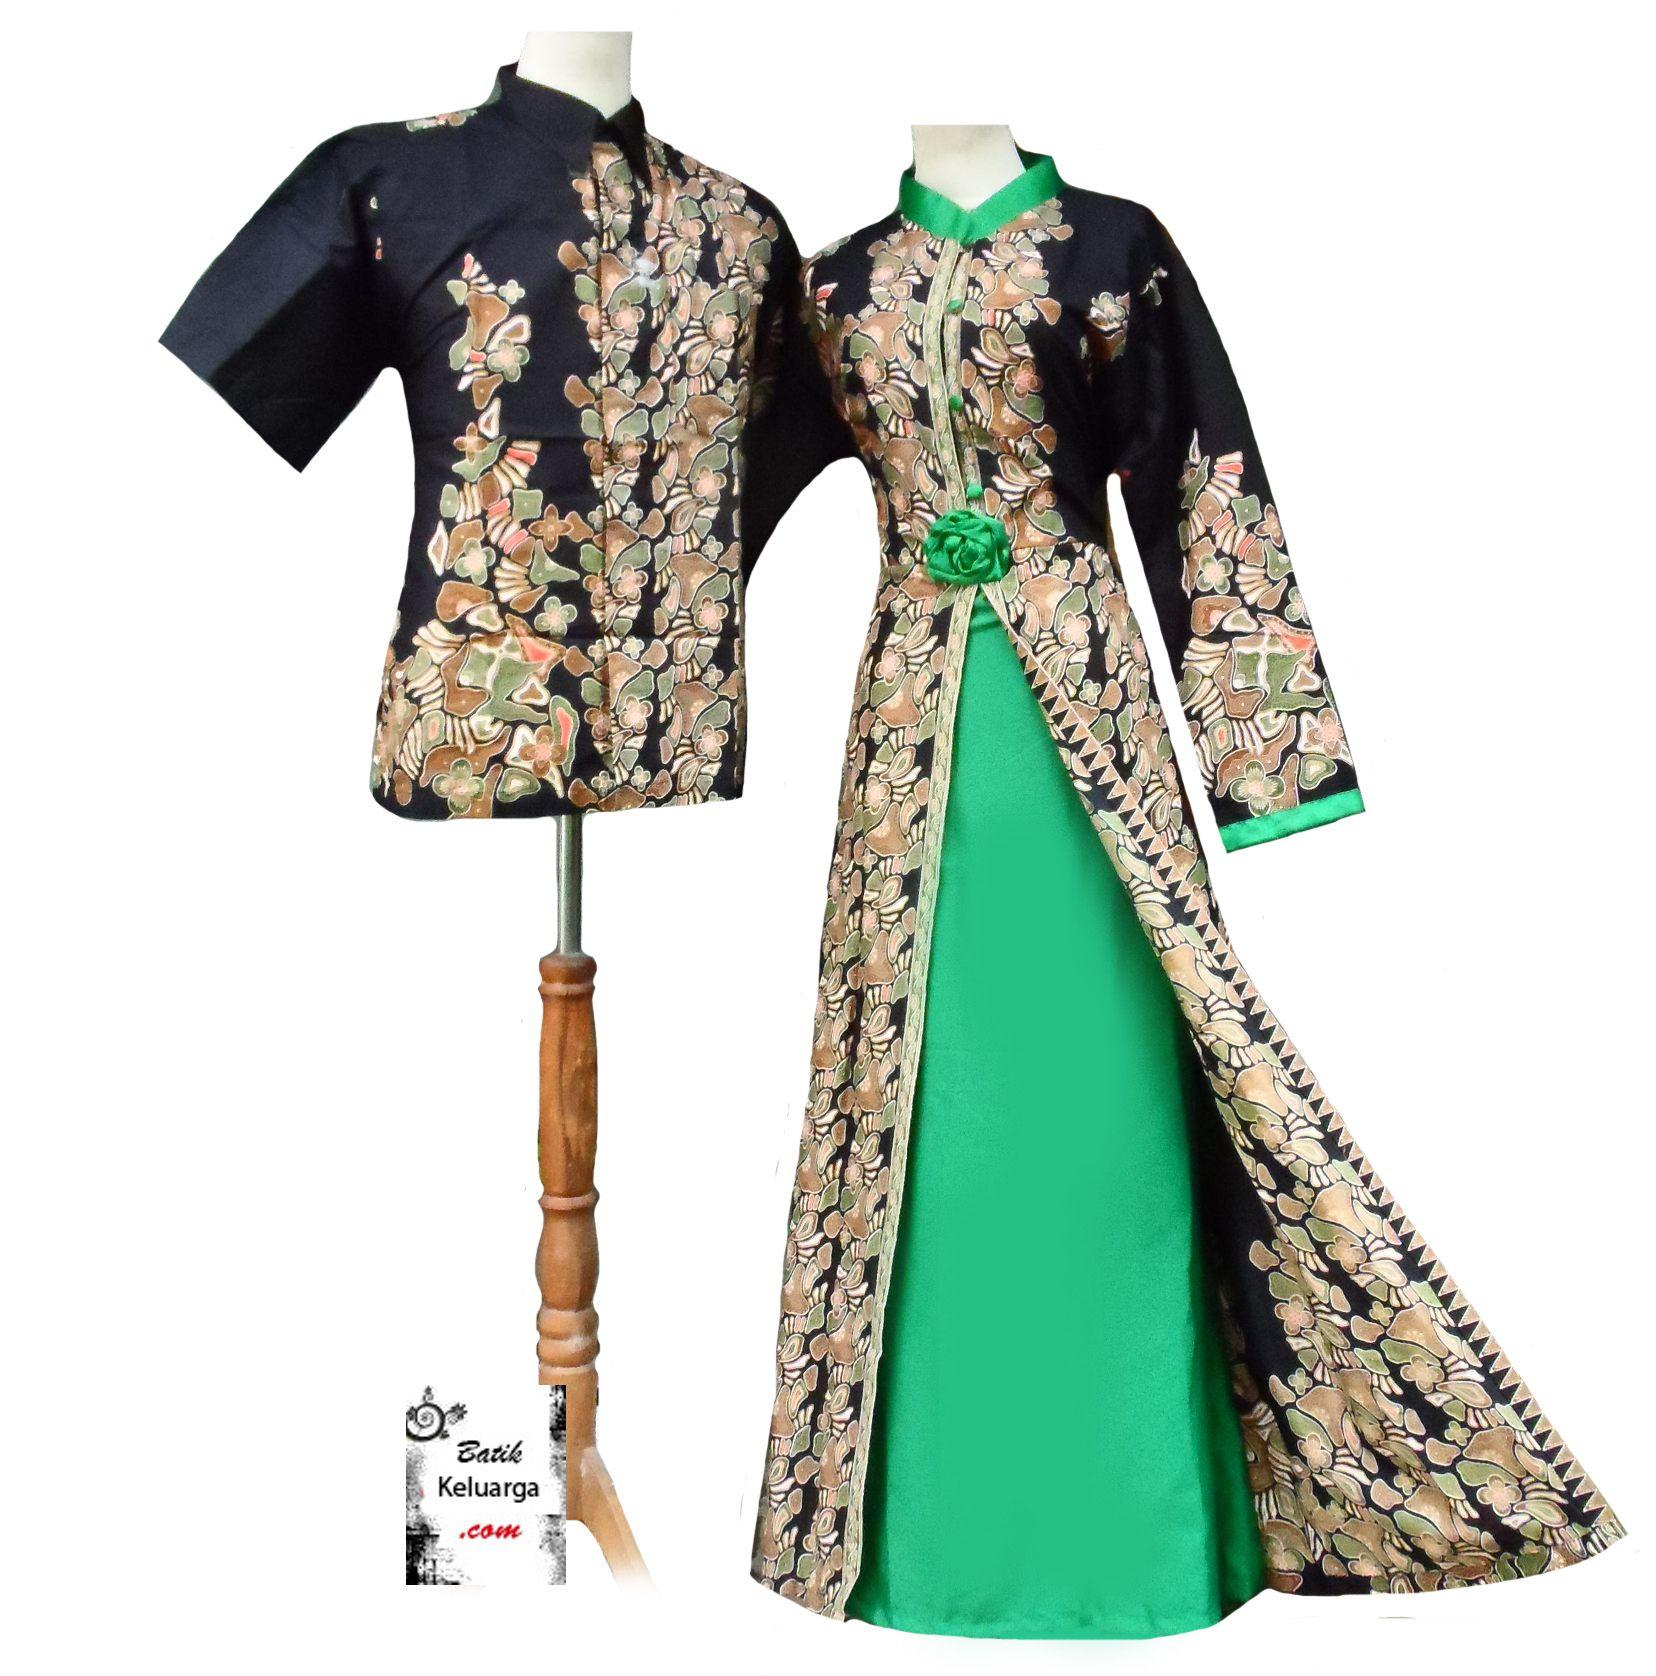 BUSANA PASANGAN TERBARU  BK0295  BATIK KELUARGA  Batik Modern